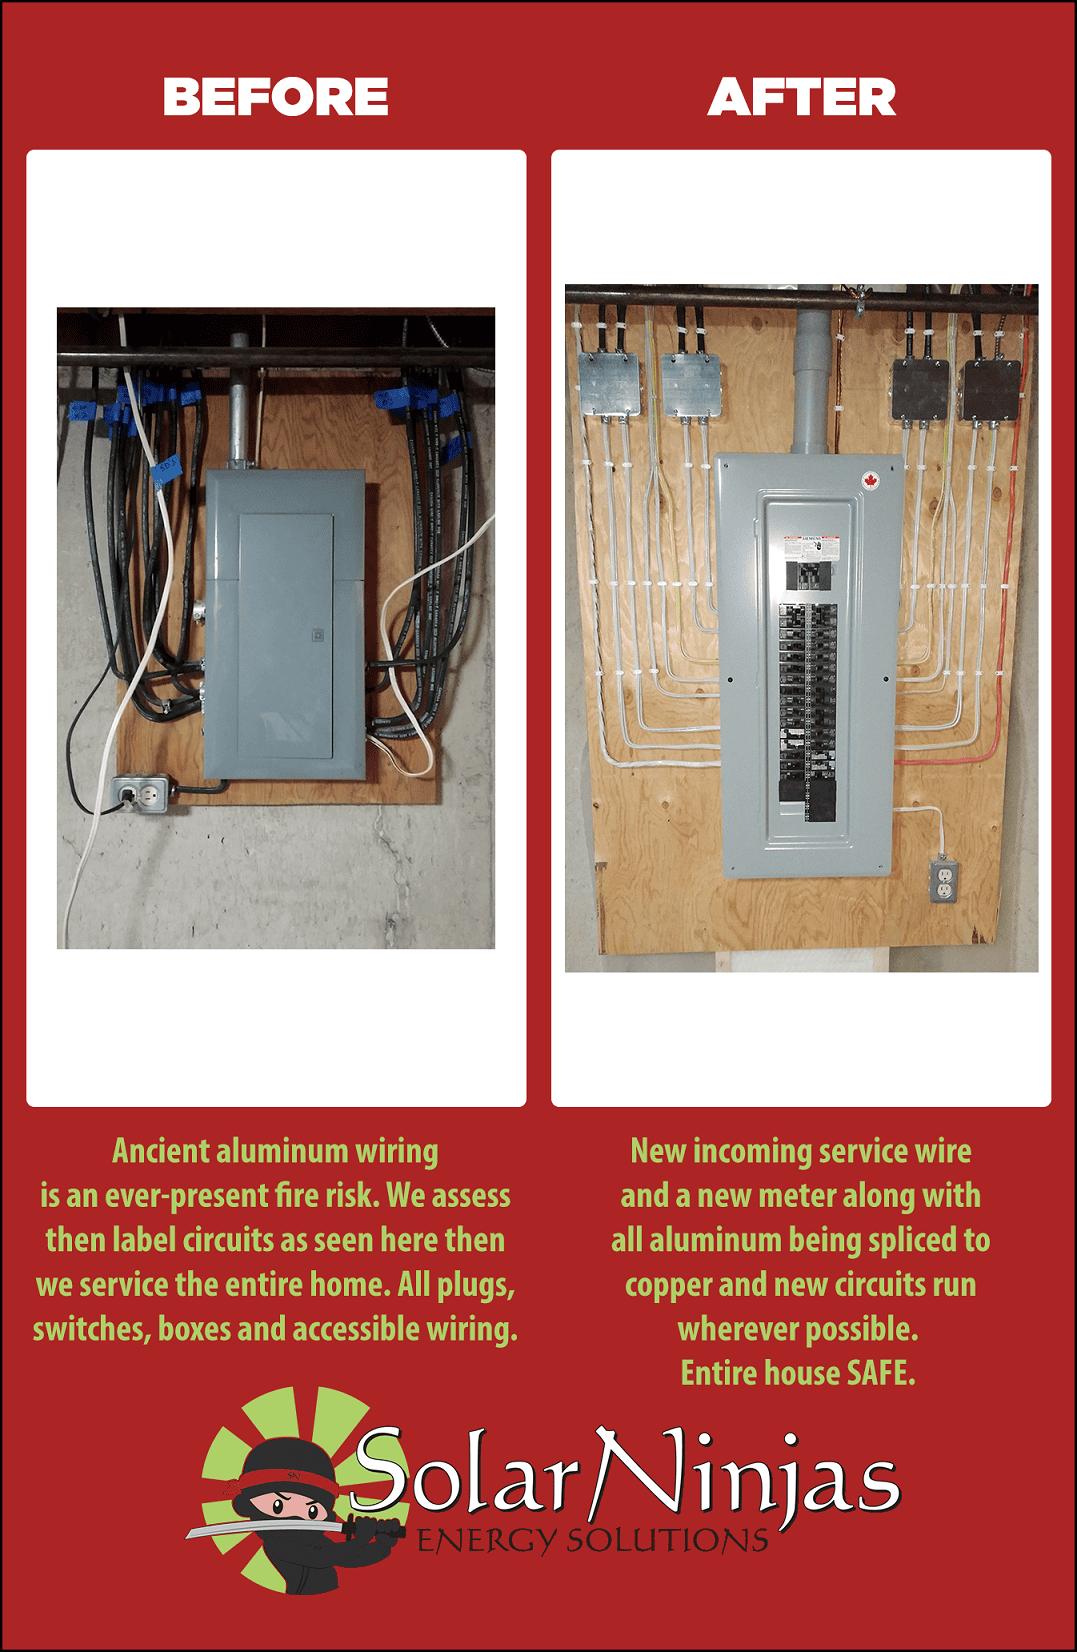 SolarNinjas Aluminum Wiring Before & After